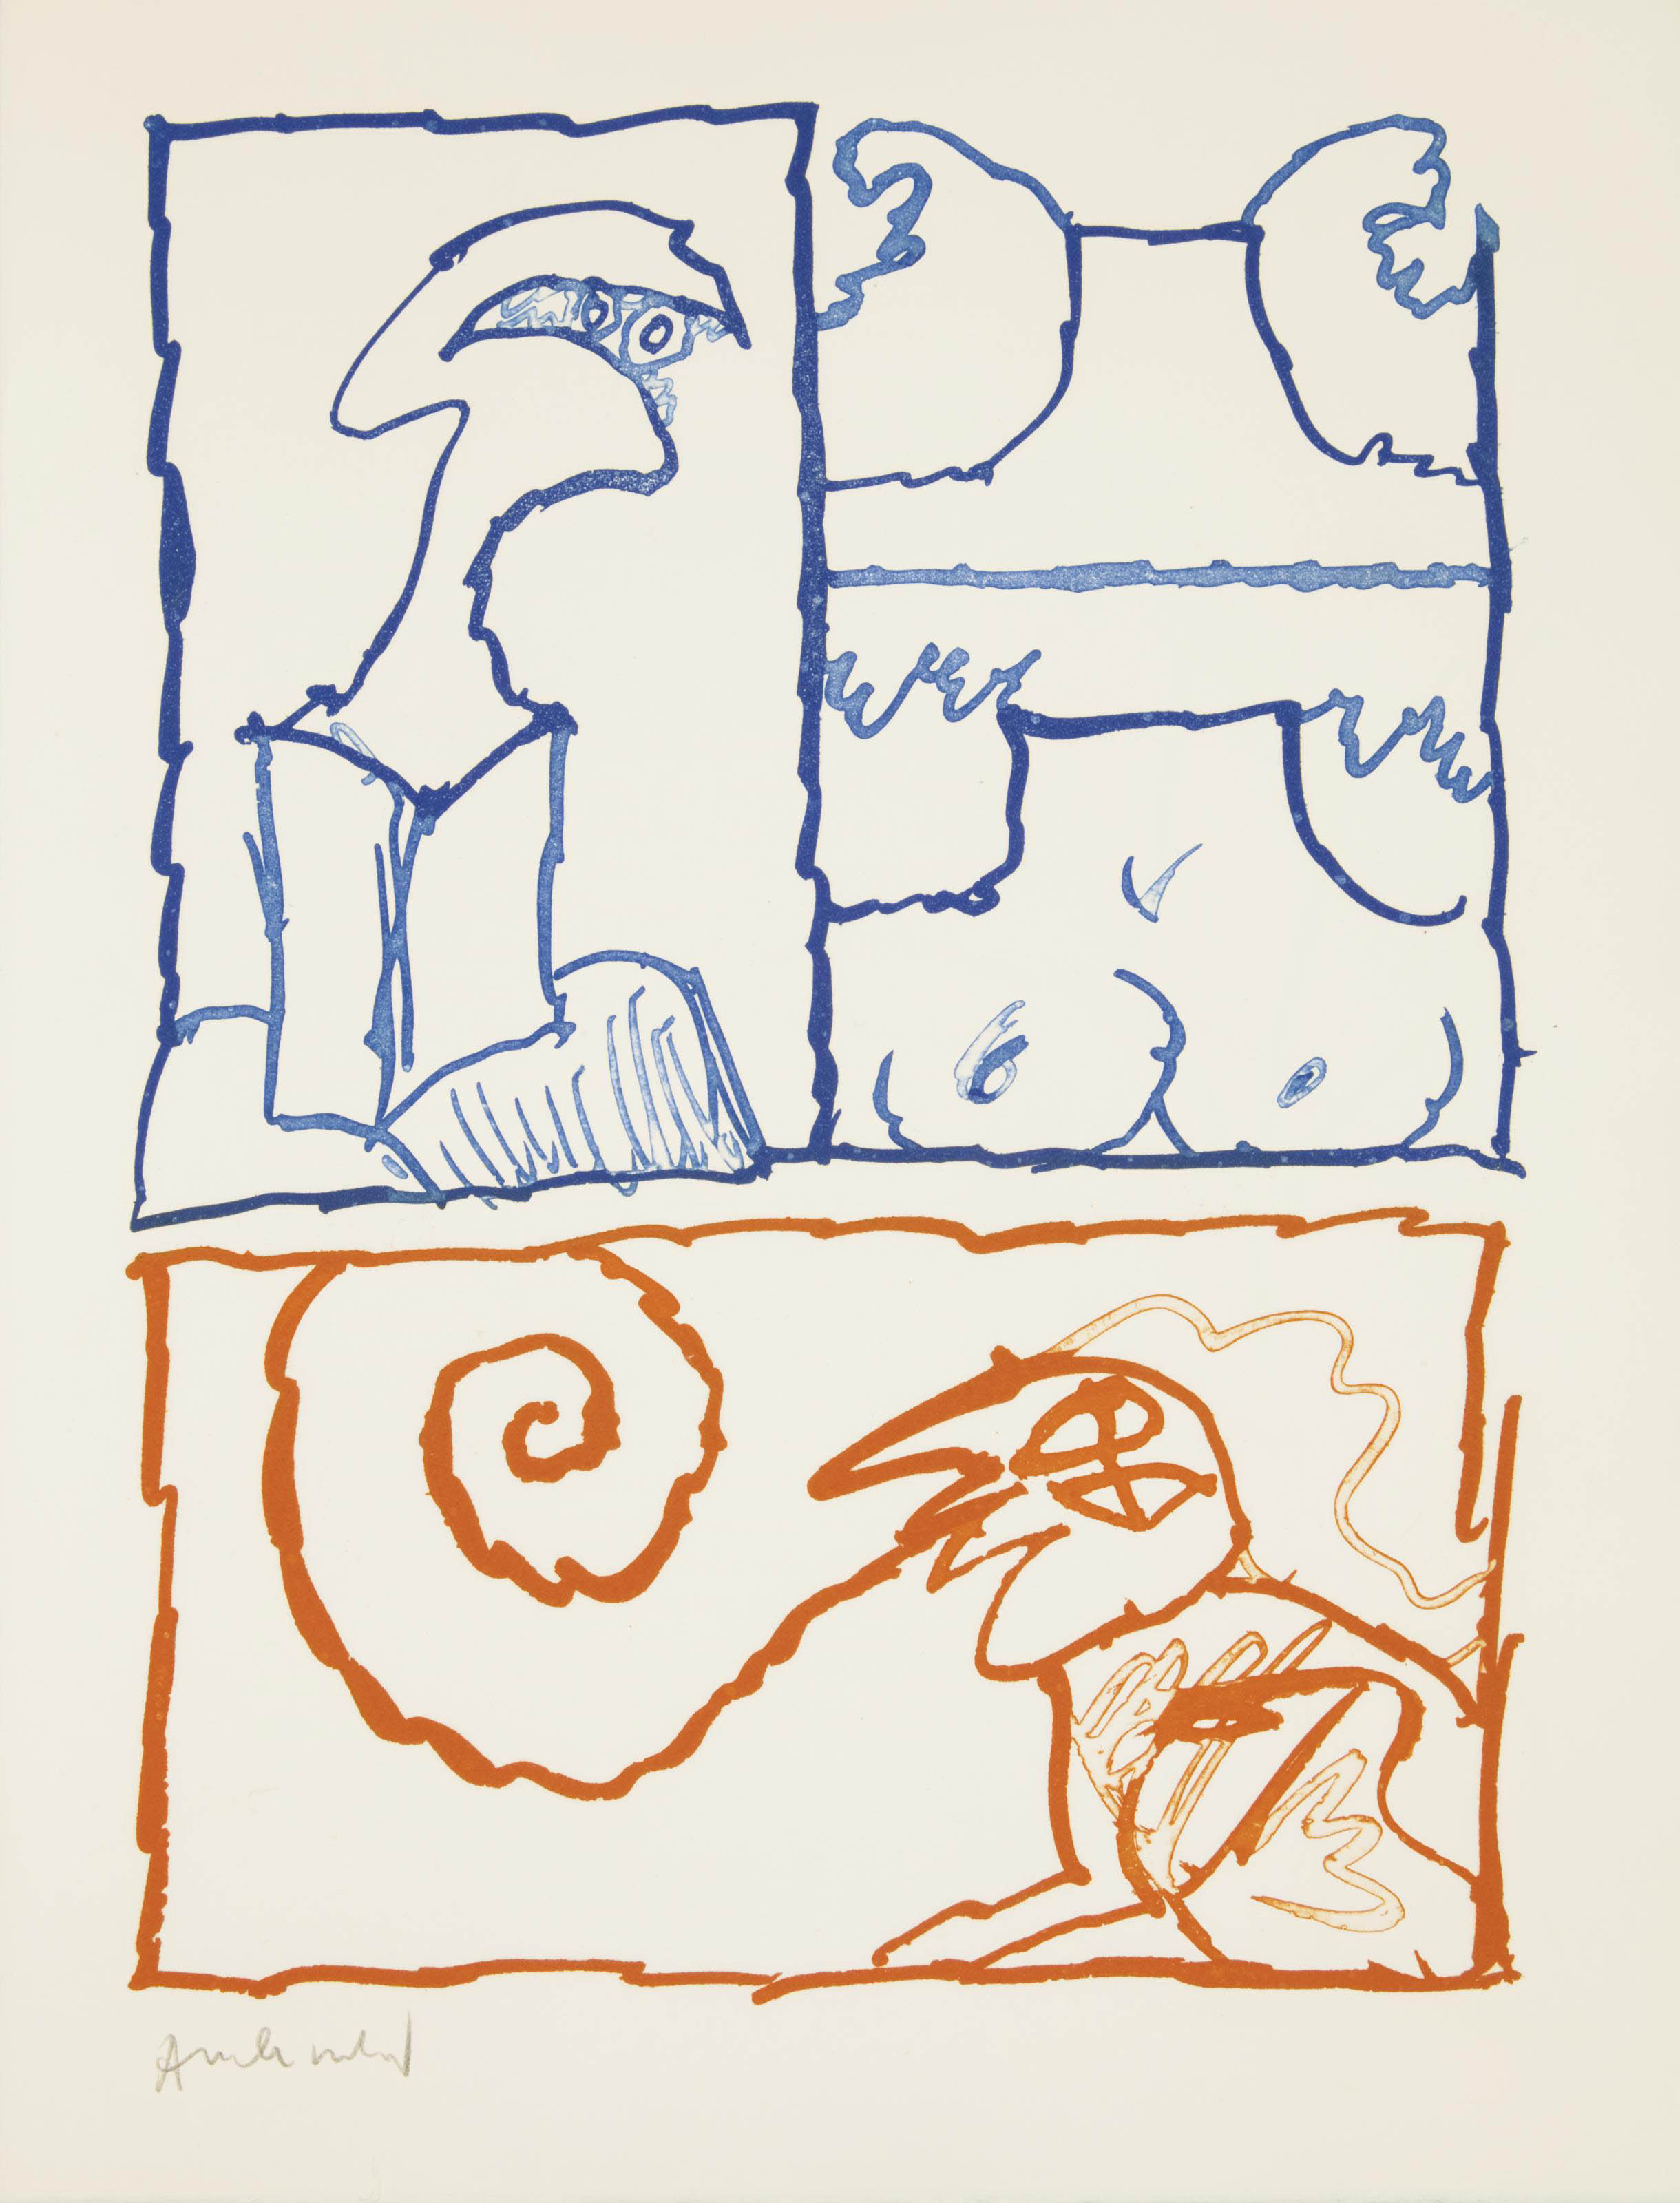 [ALECHINSKY] -- BUTOR, Michel (né en 1926). Le Rêve de l'ammonite. Paris: Éditions Fata Morgana, [1975].